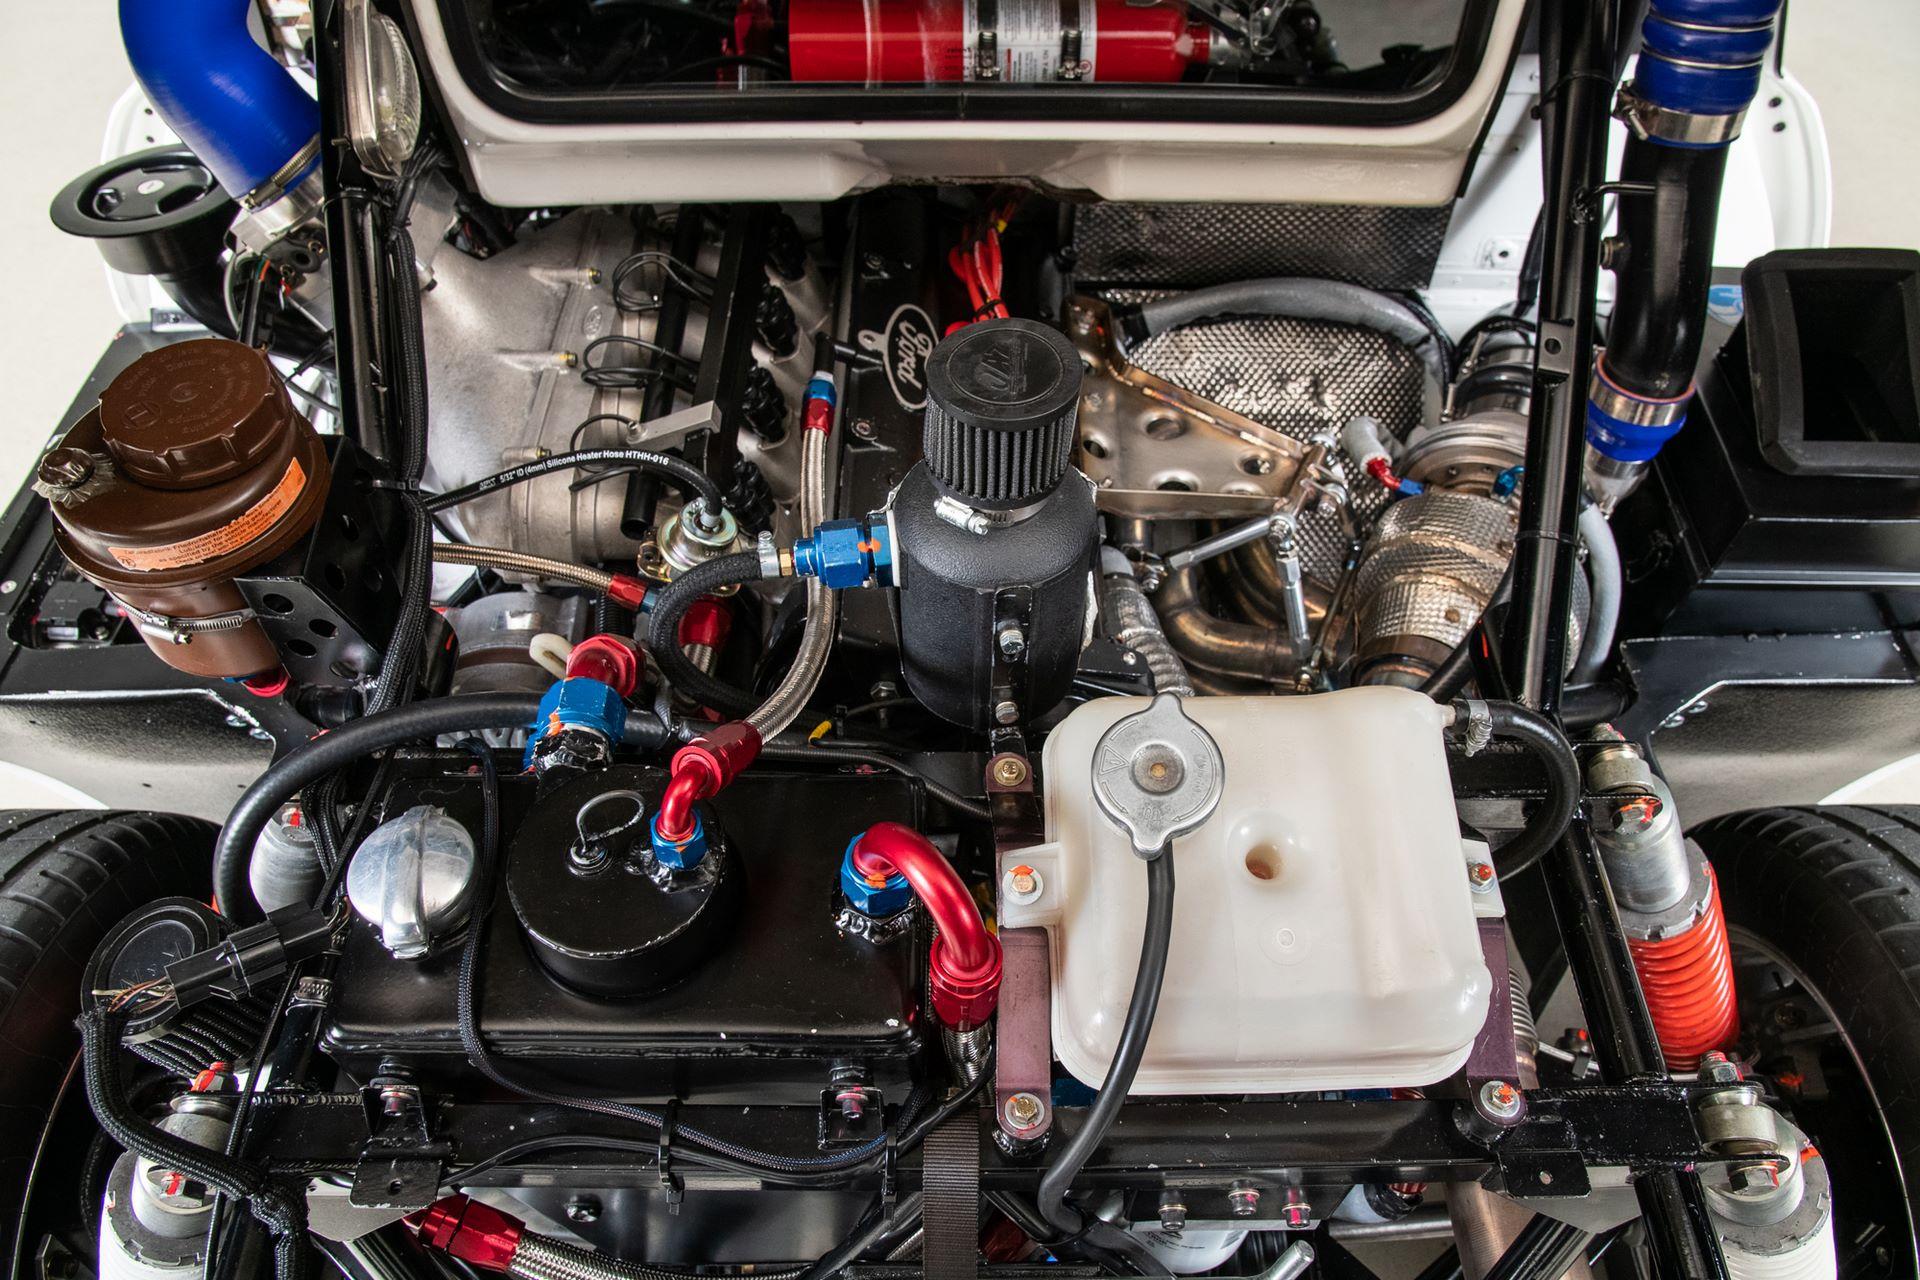 Ford-RS200-Evolution-Evo-for-sale-28